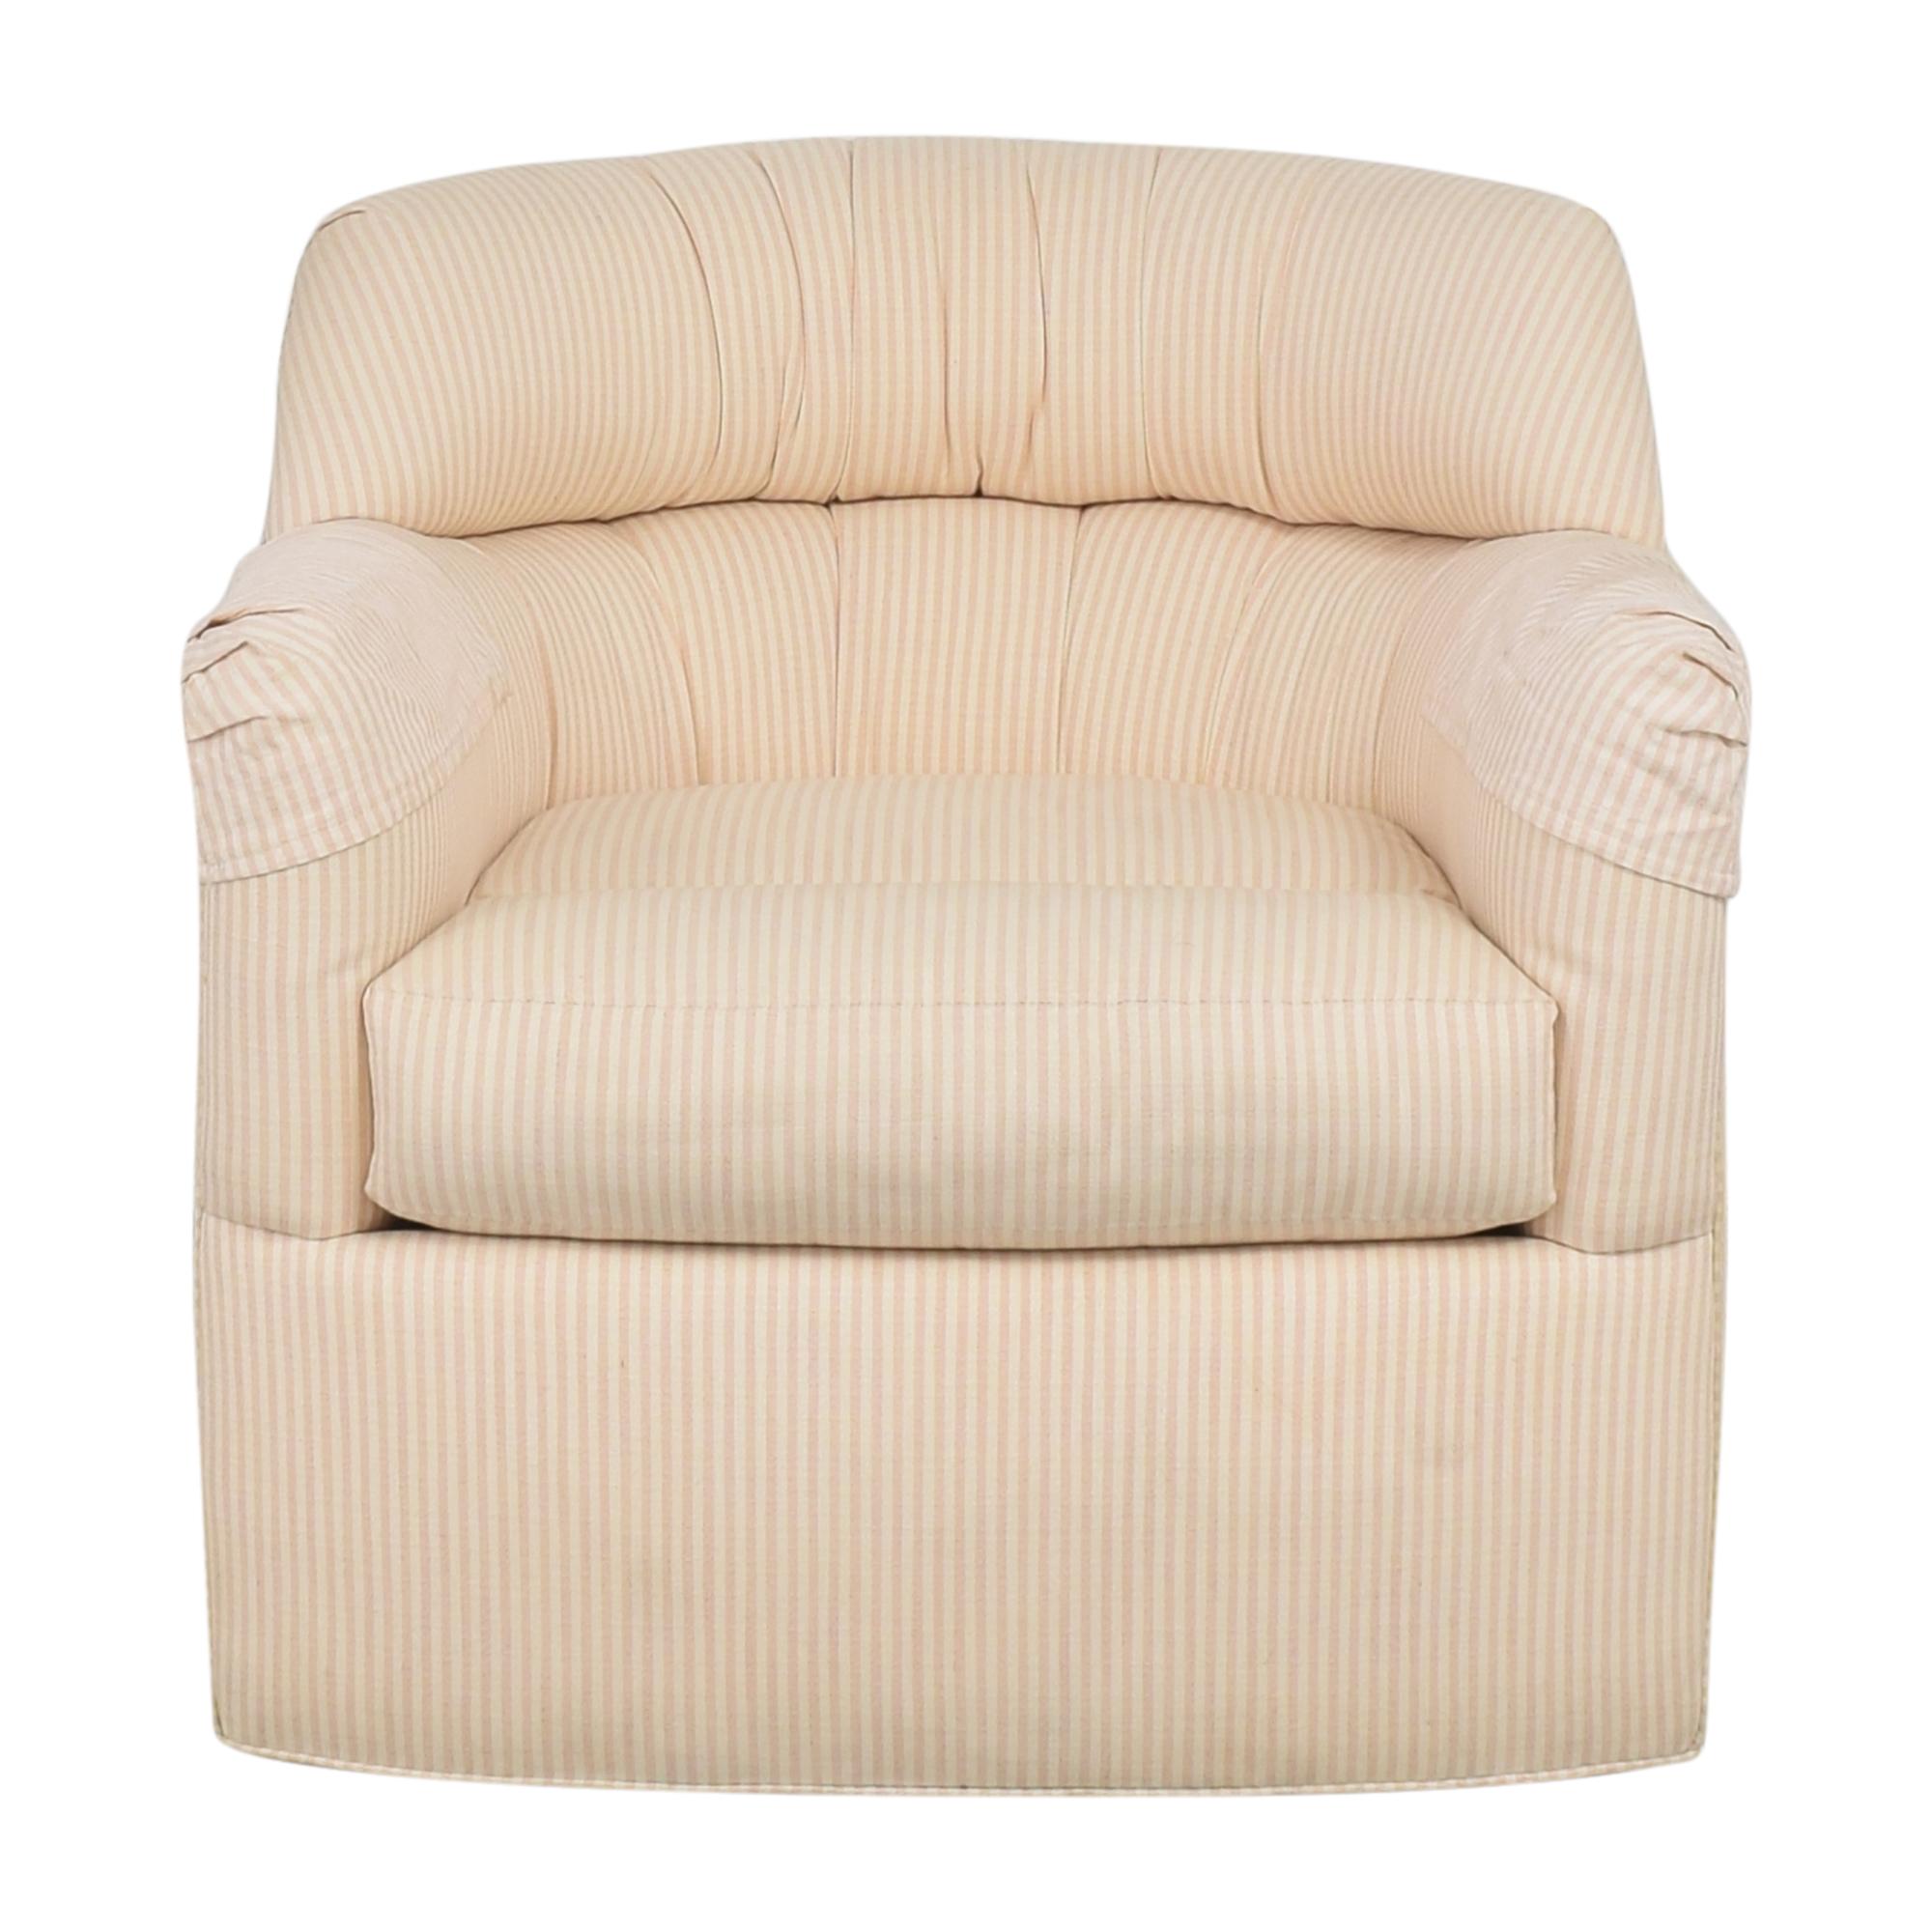 Sherrill Furniture Sherrill Furniture Swivel Armchair nj